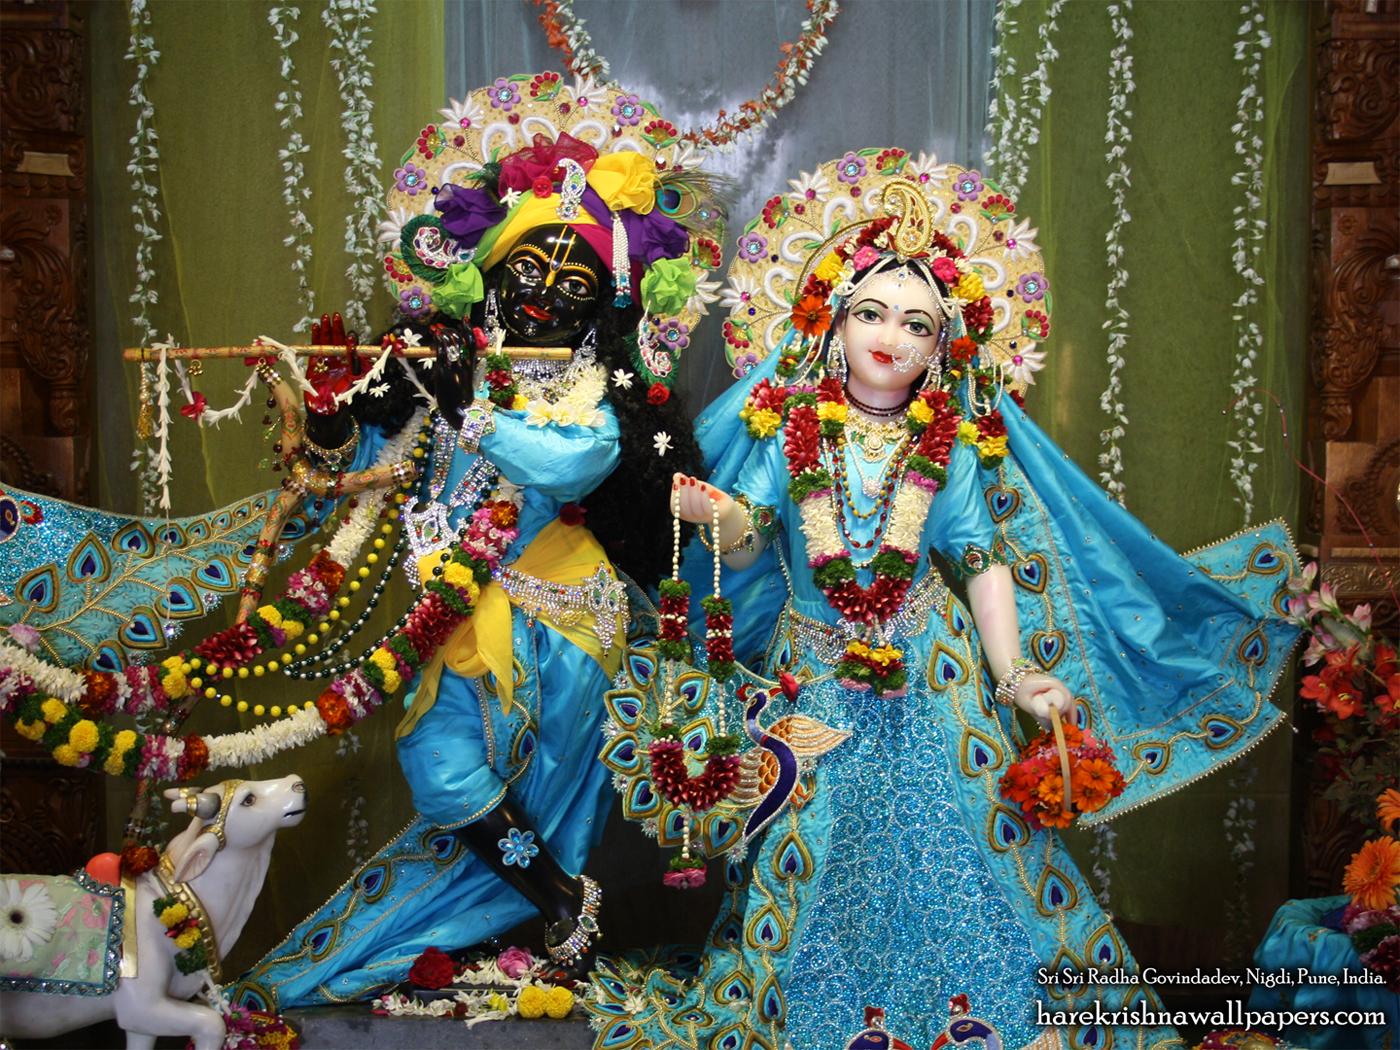 Sri Sri Radha Govind Wallpaper (021) Size 1400x1050 Download